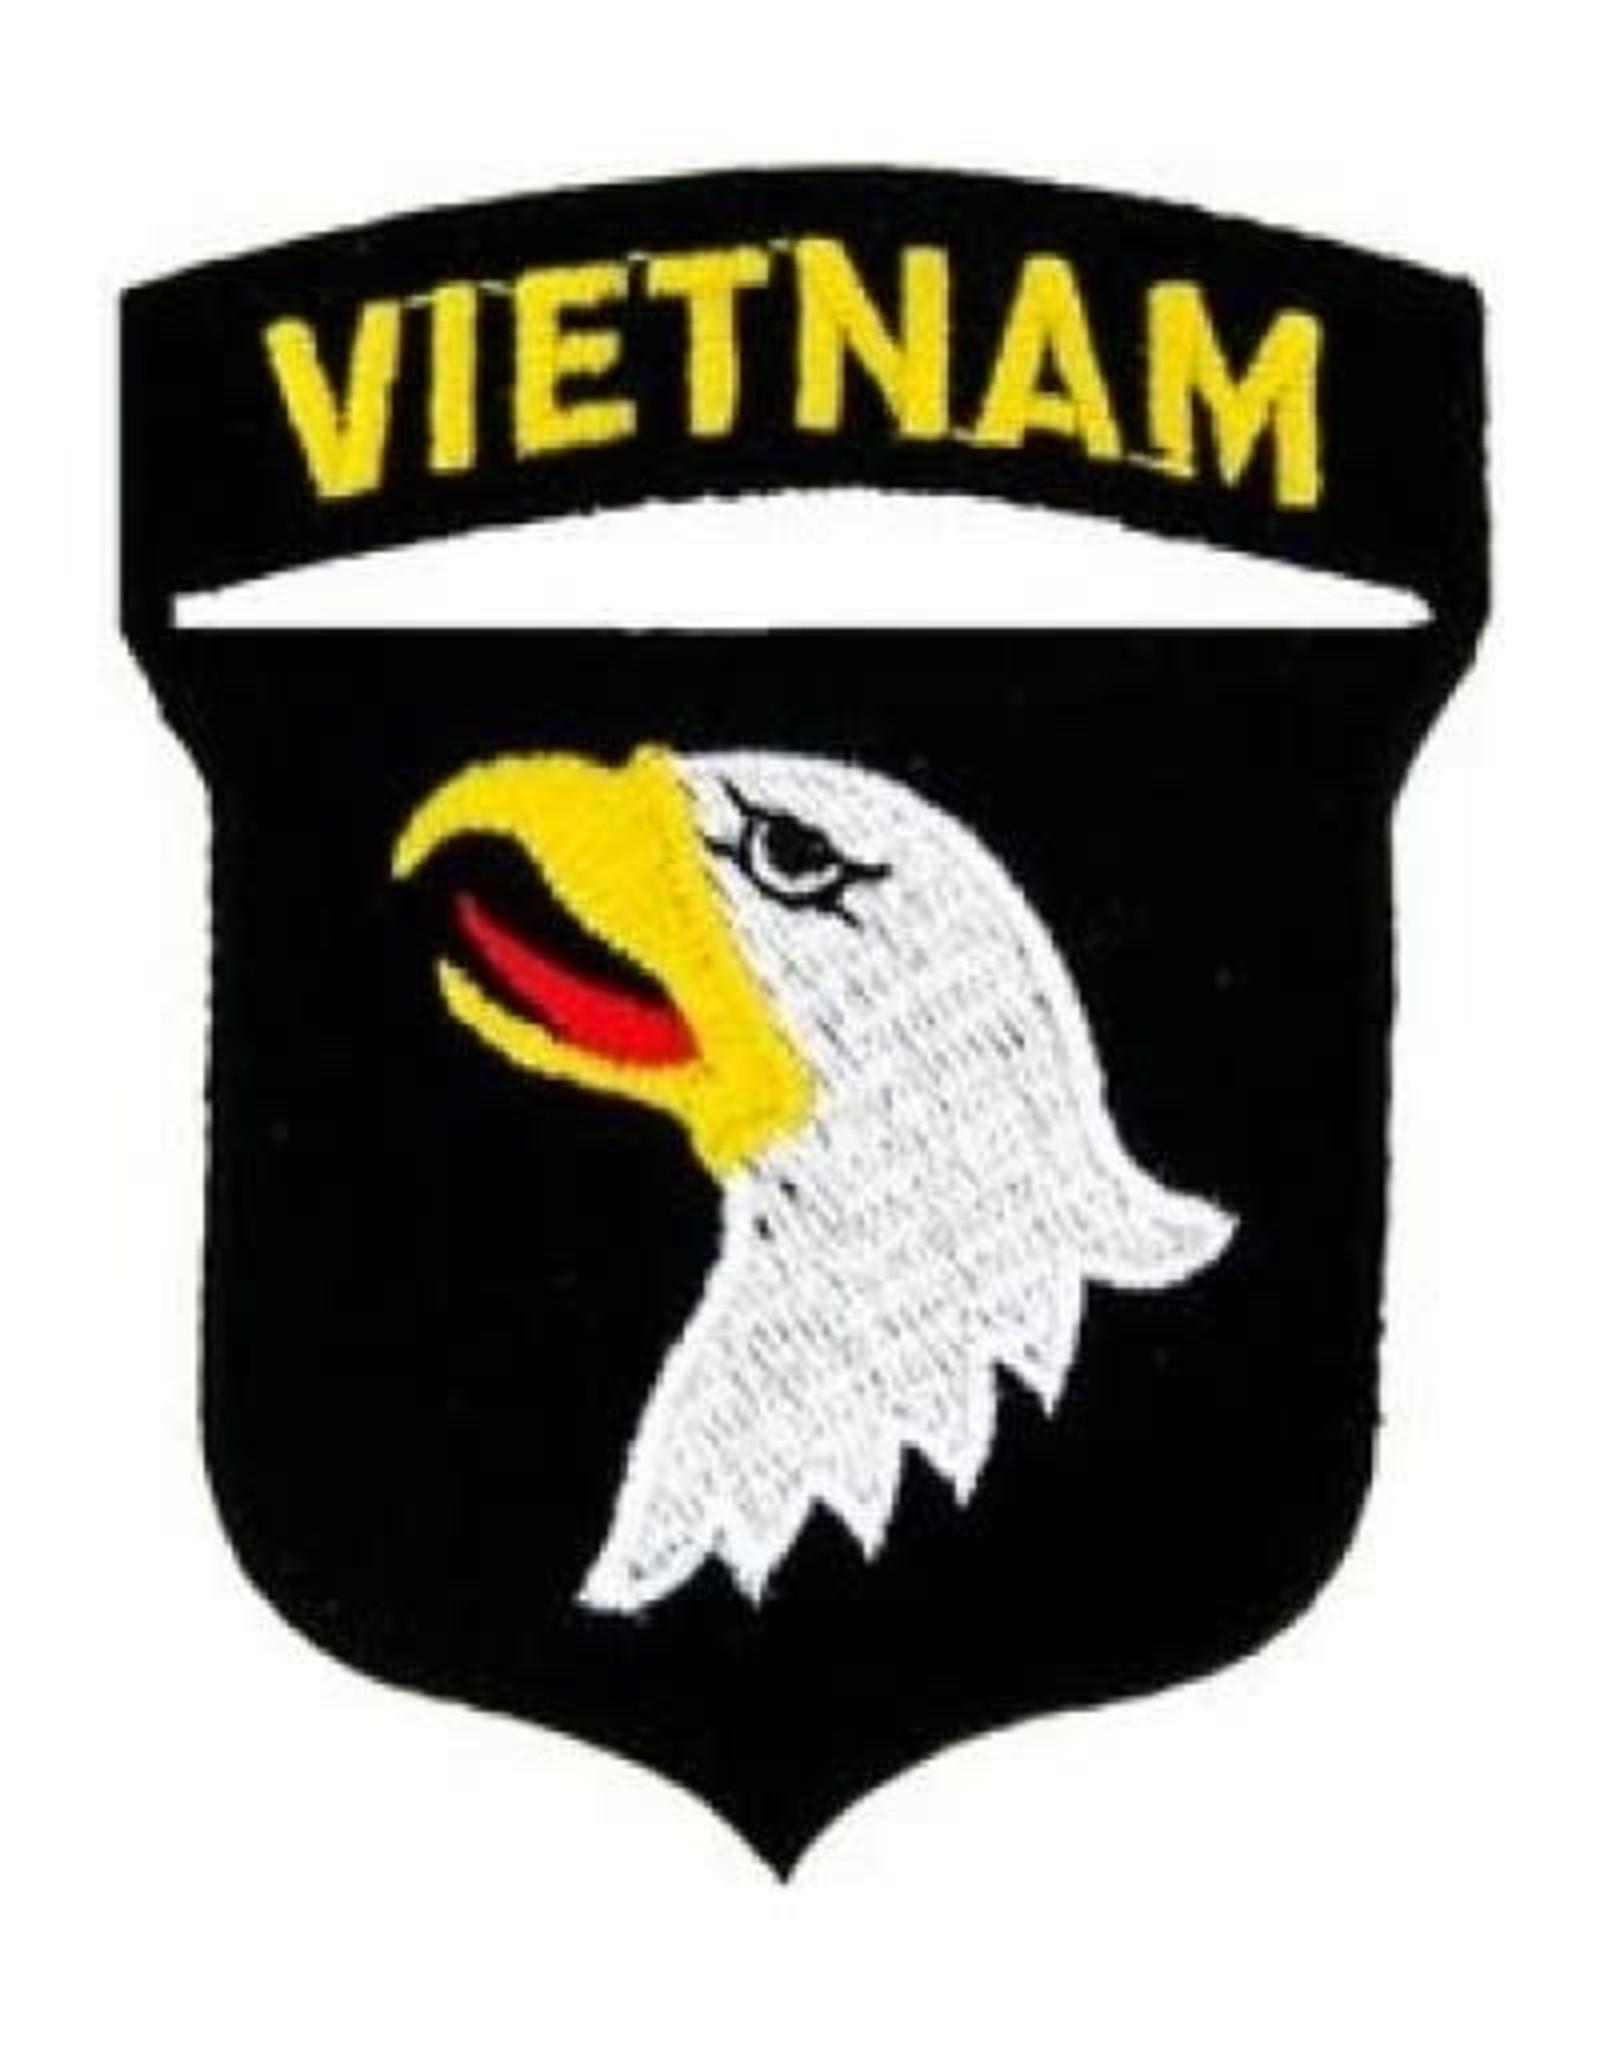 "MidMil Embroidered 101st Airborne Vietnam Emblem Patch 2.5"" wide x 3.1"" high"